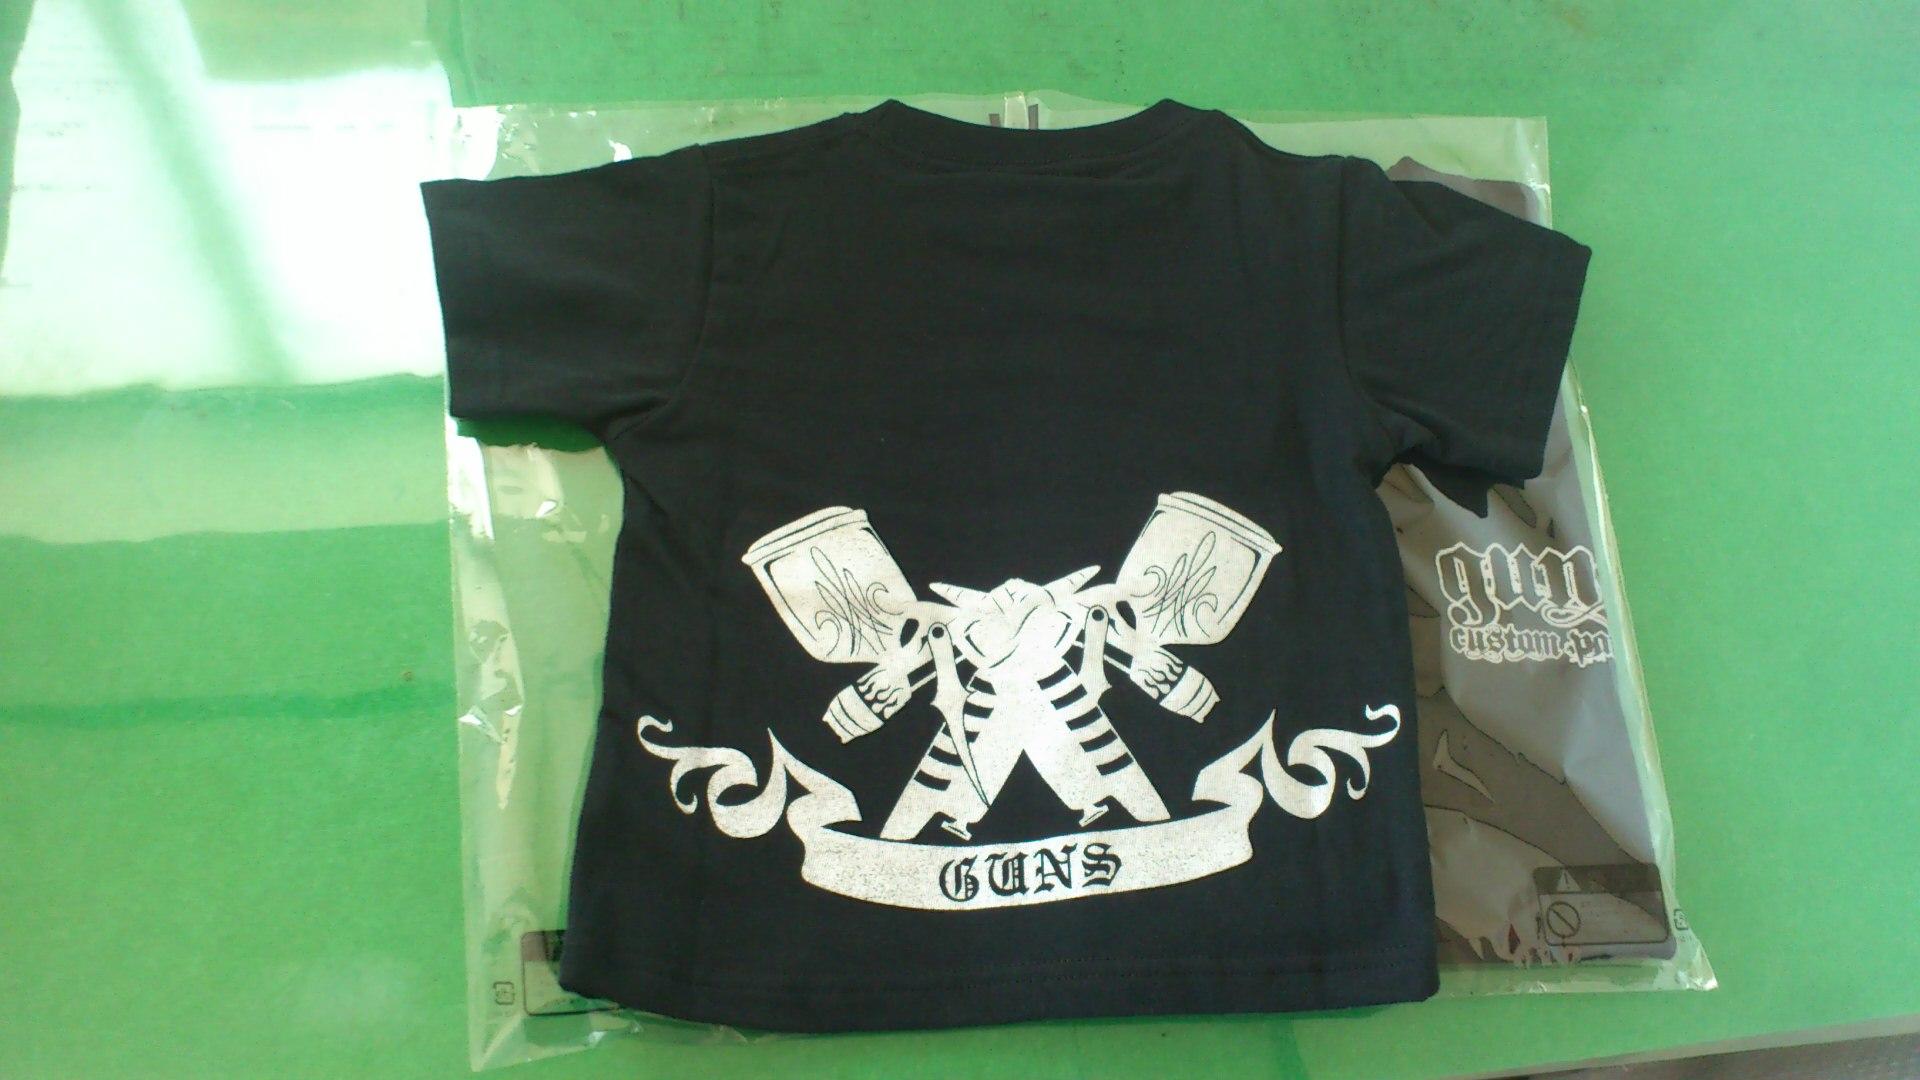 GUNS T-shirt_e0269313_1620578.jpg